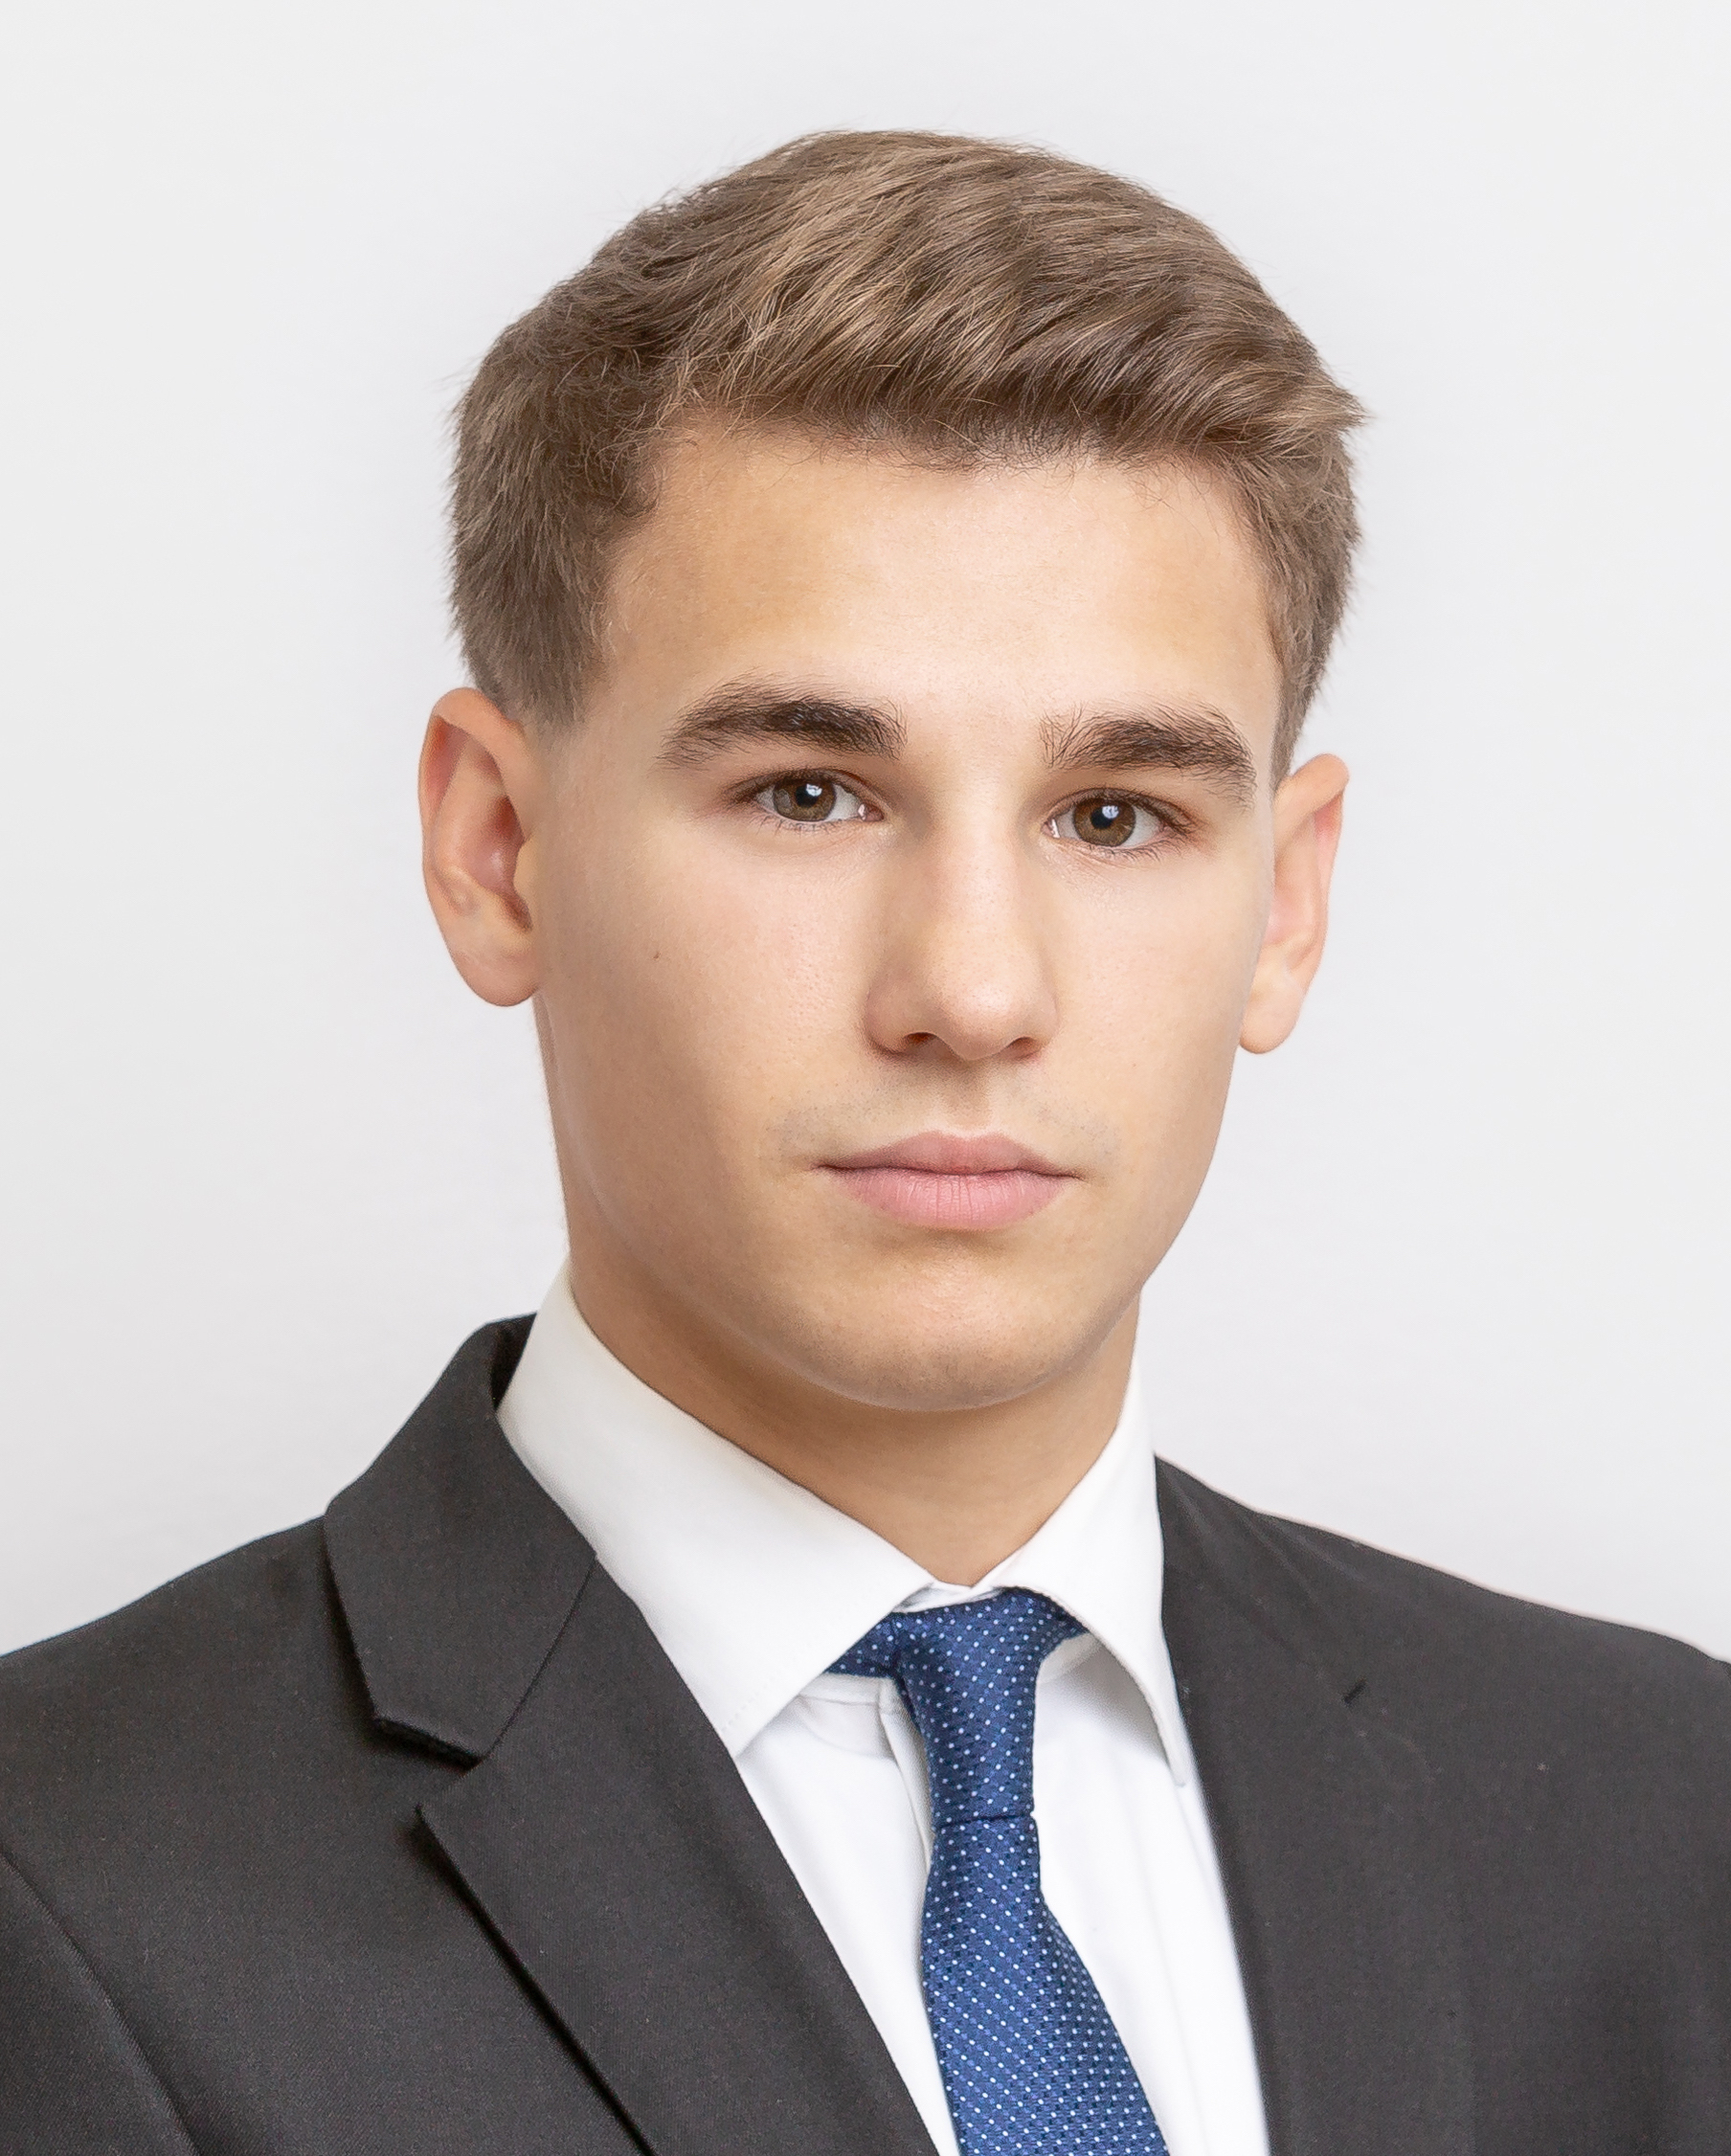 Elias Pock - Head of Enlargement